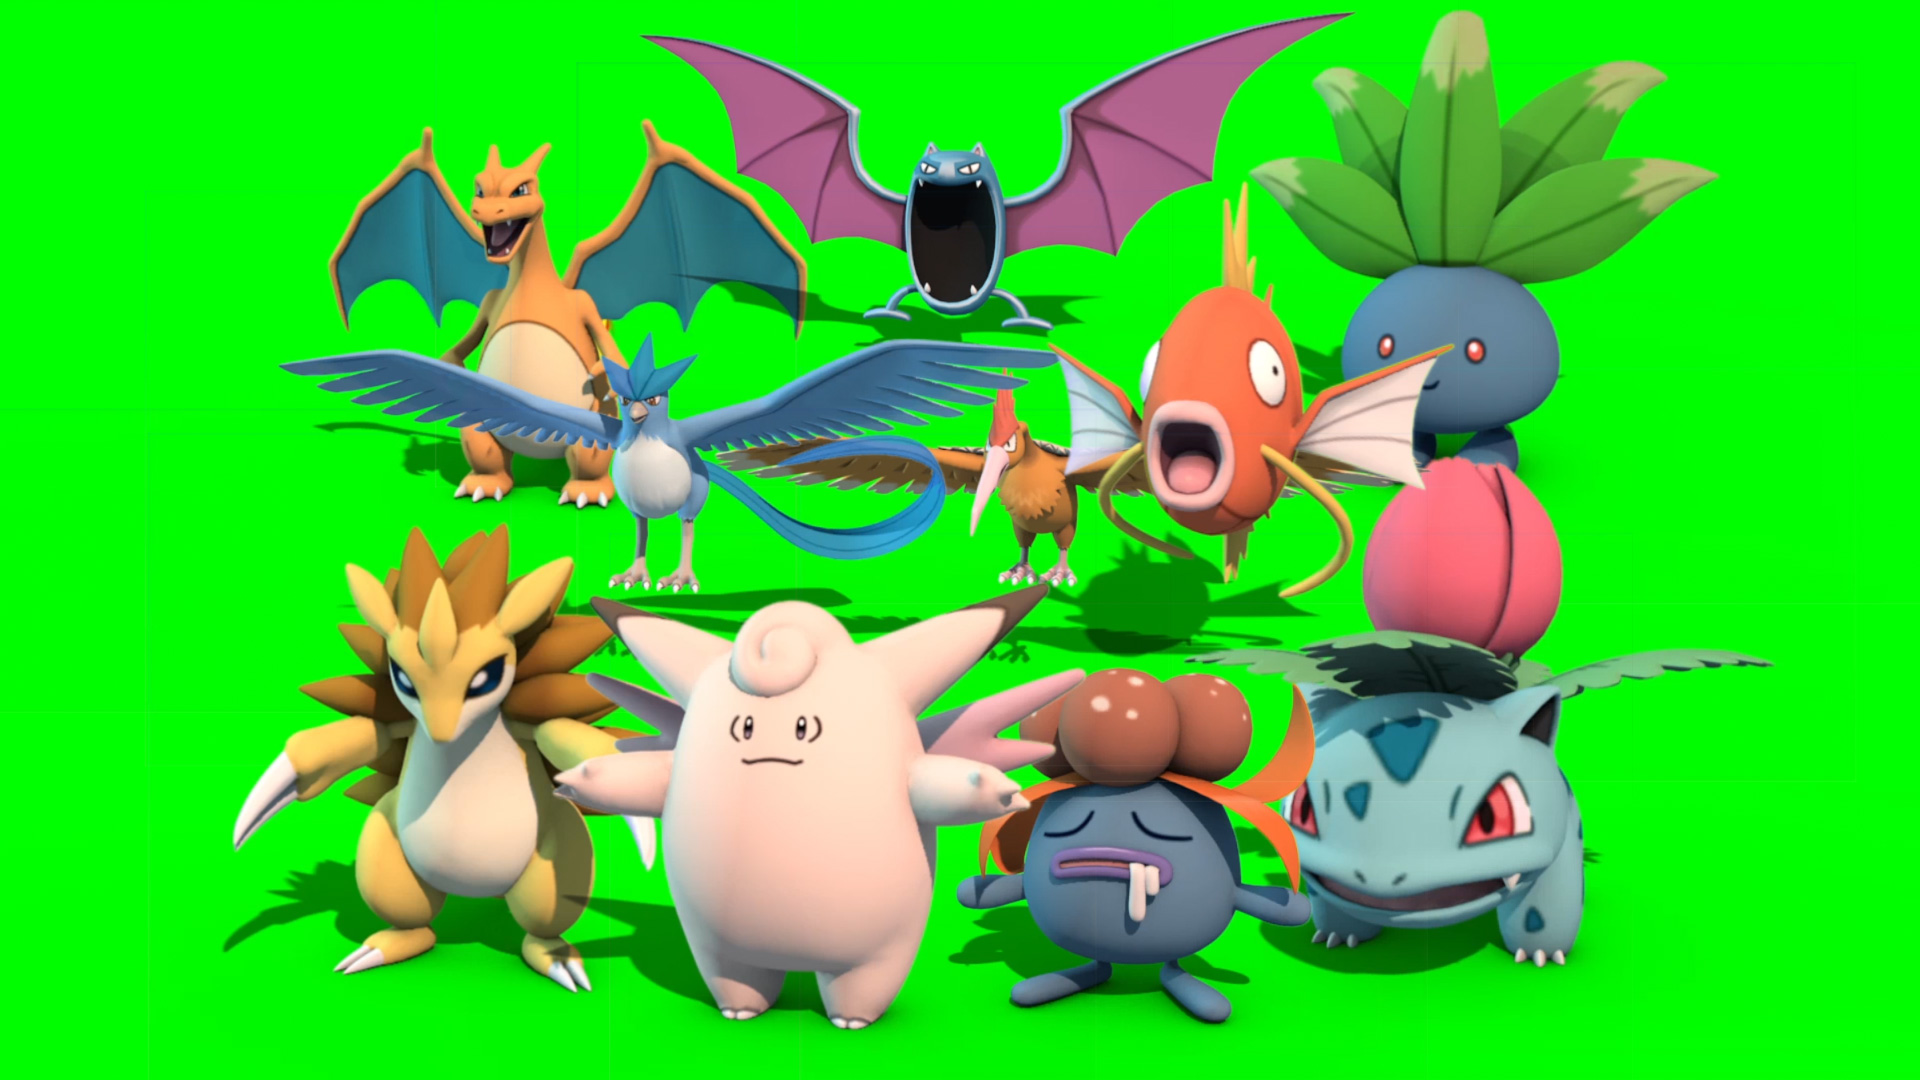 10 Pokemon 1st Gen 3d Model Animated Pixelboom